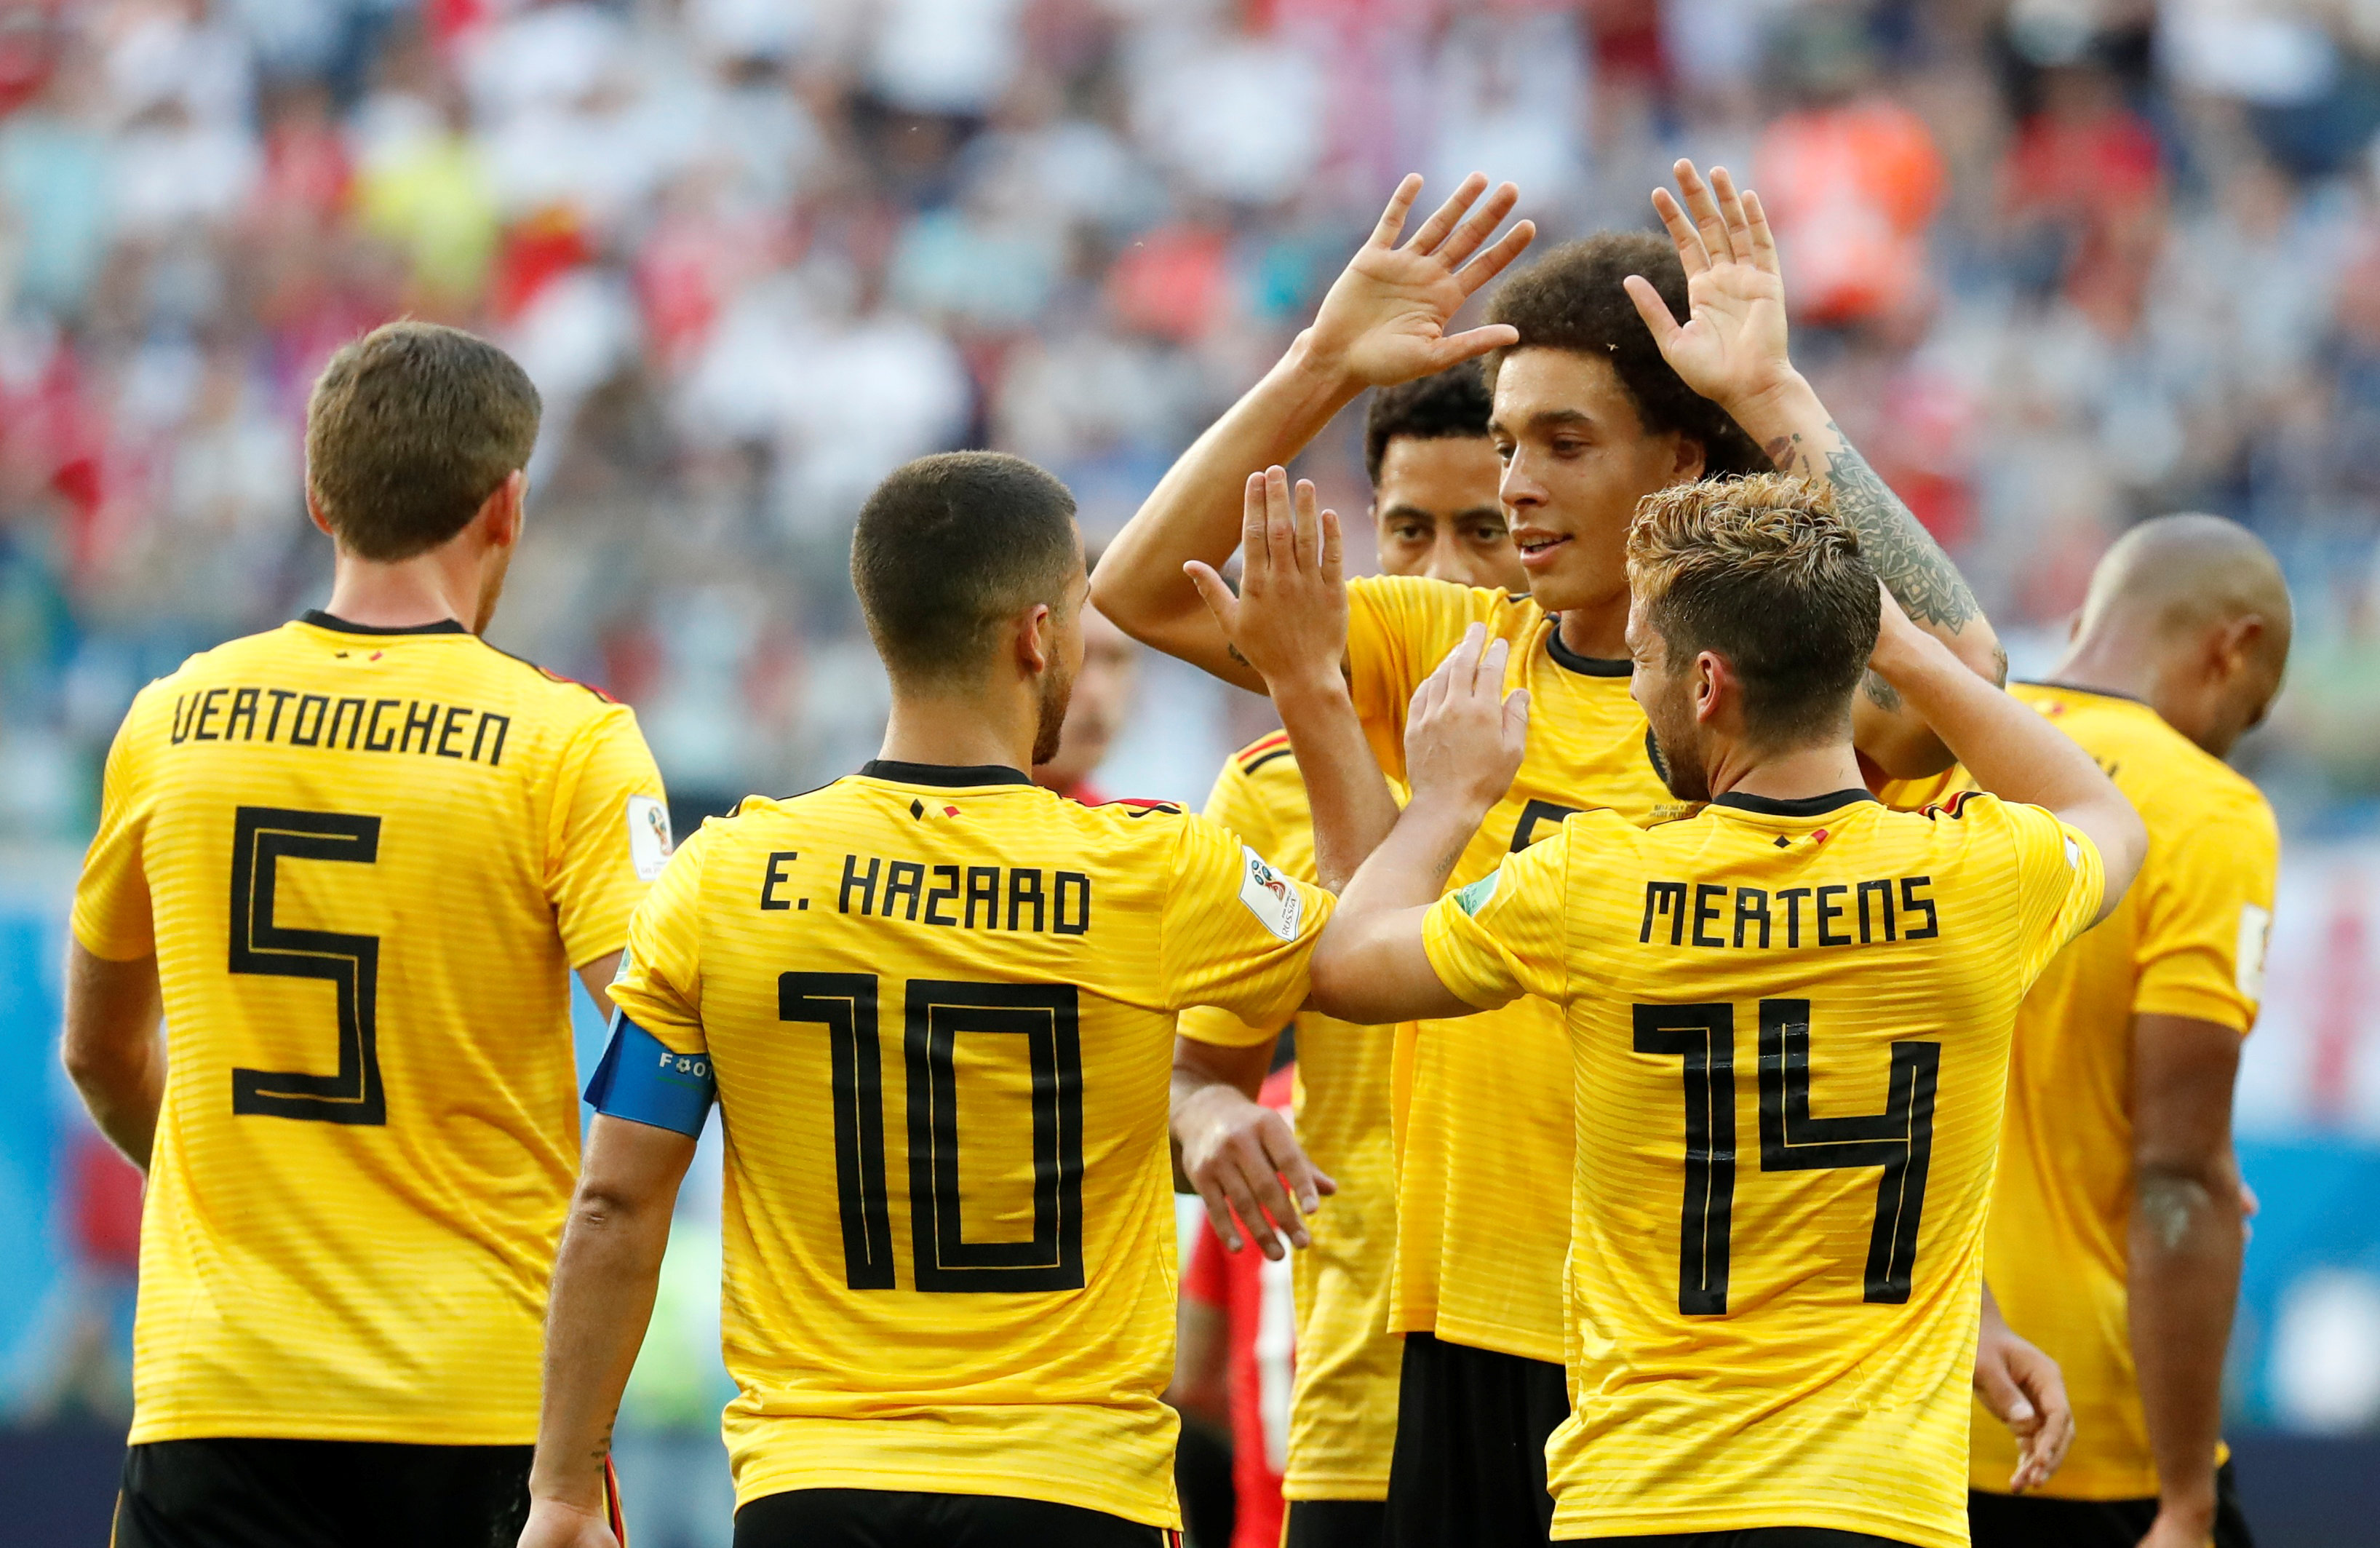 Belgium beat England to secure third place finish